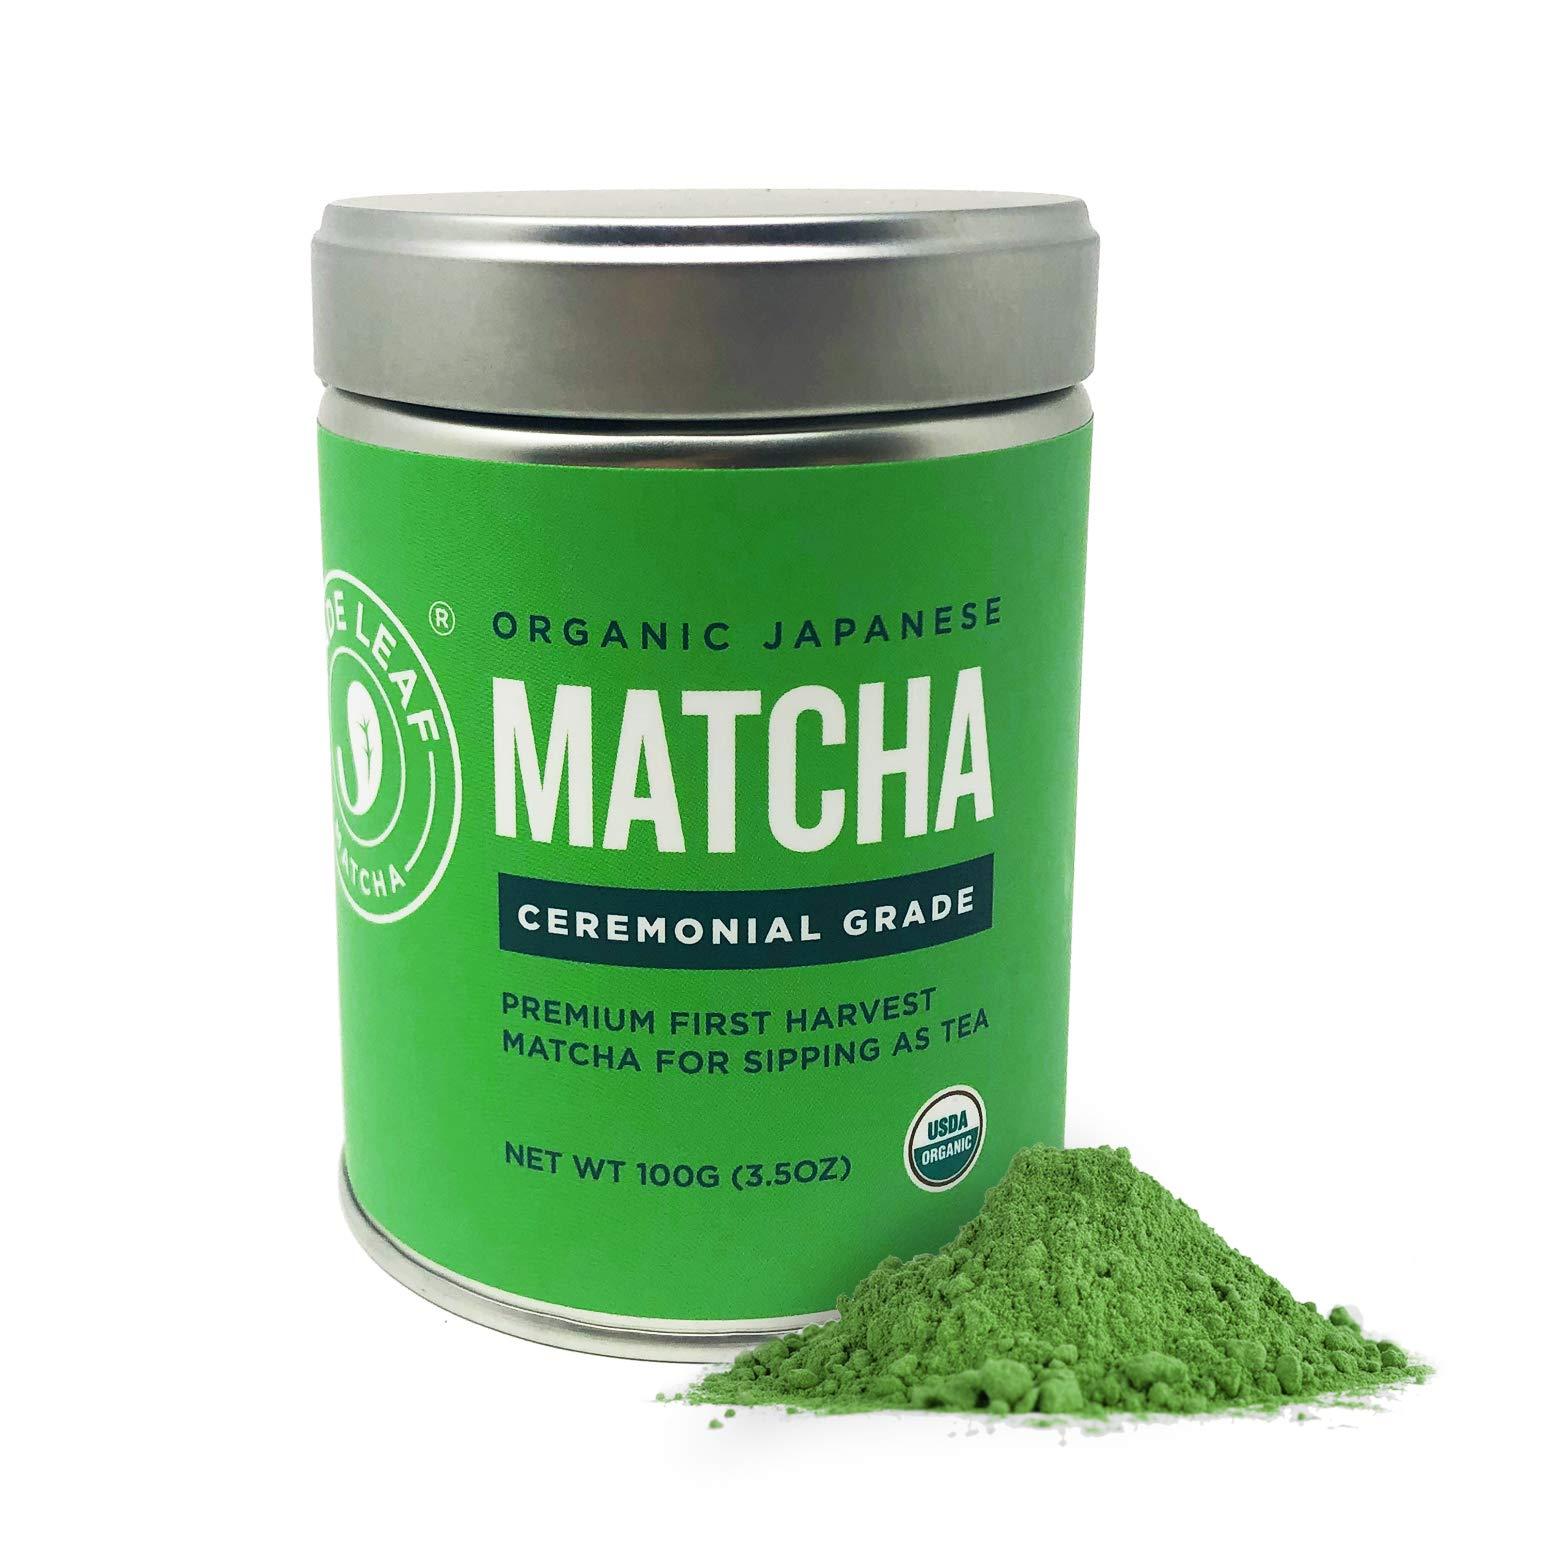 Jade Leaf Matcha Green Tea Powder - USDA Organic - Ceremonial Grade (For Sipping as Tea) - Authentic Japanese Origin - Antioxidants, Energy, 3.5 Ounce by Jade Leaf Matcha